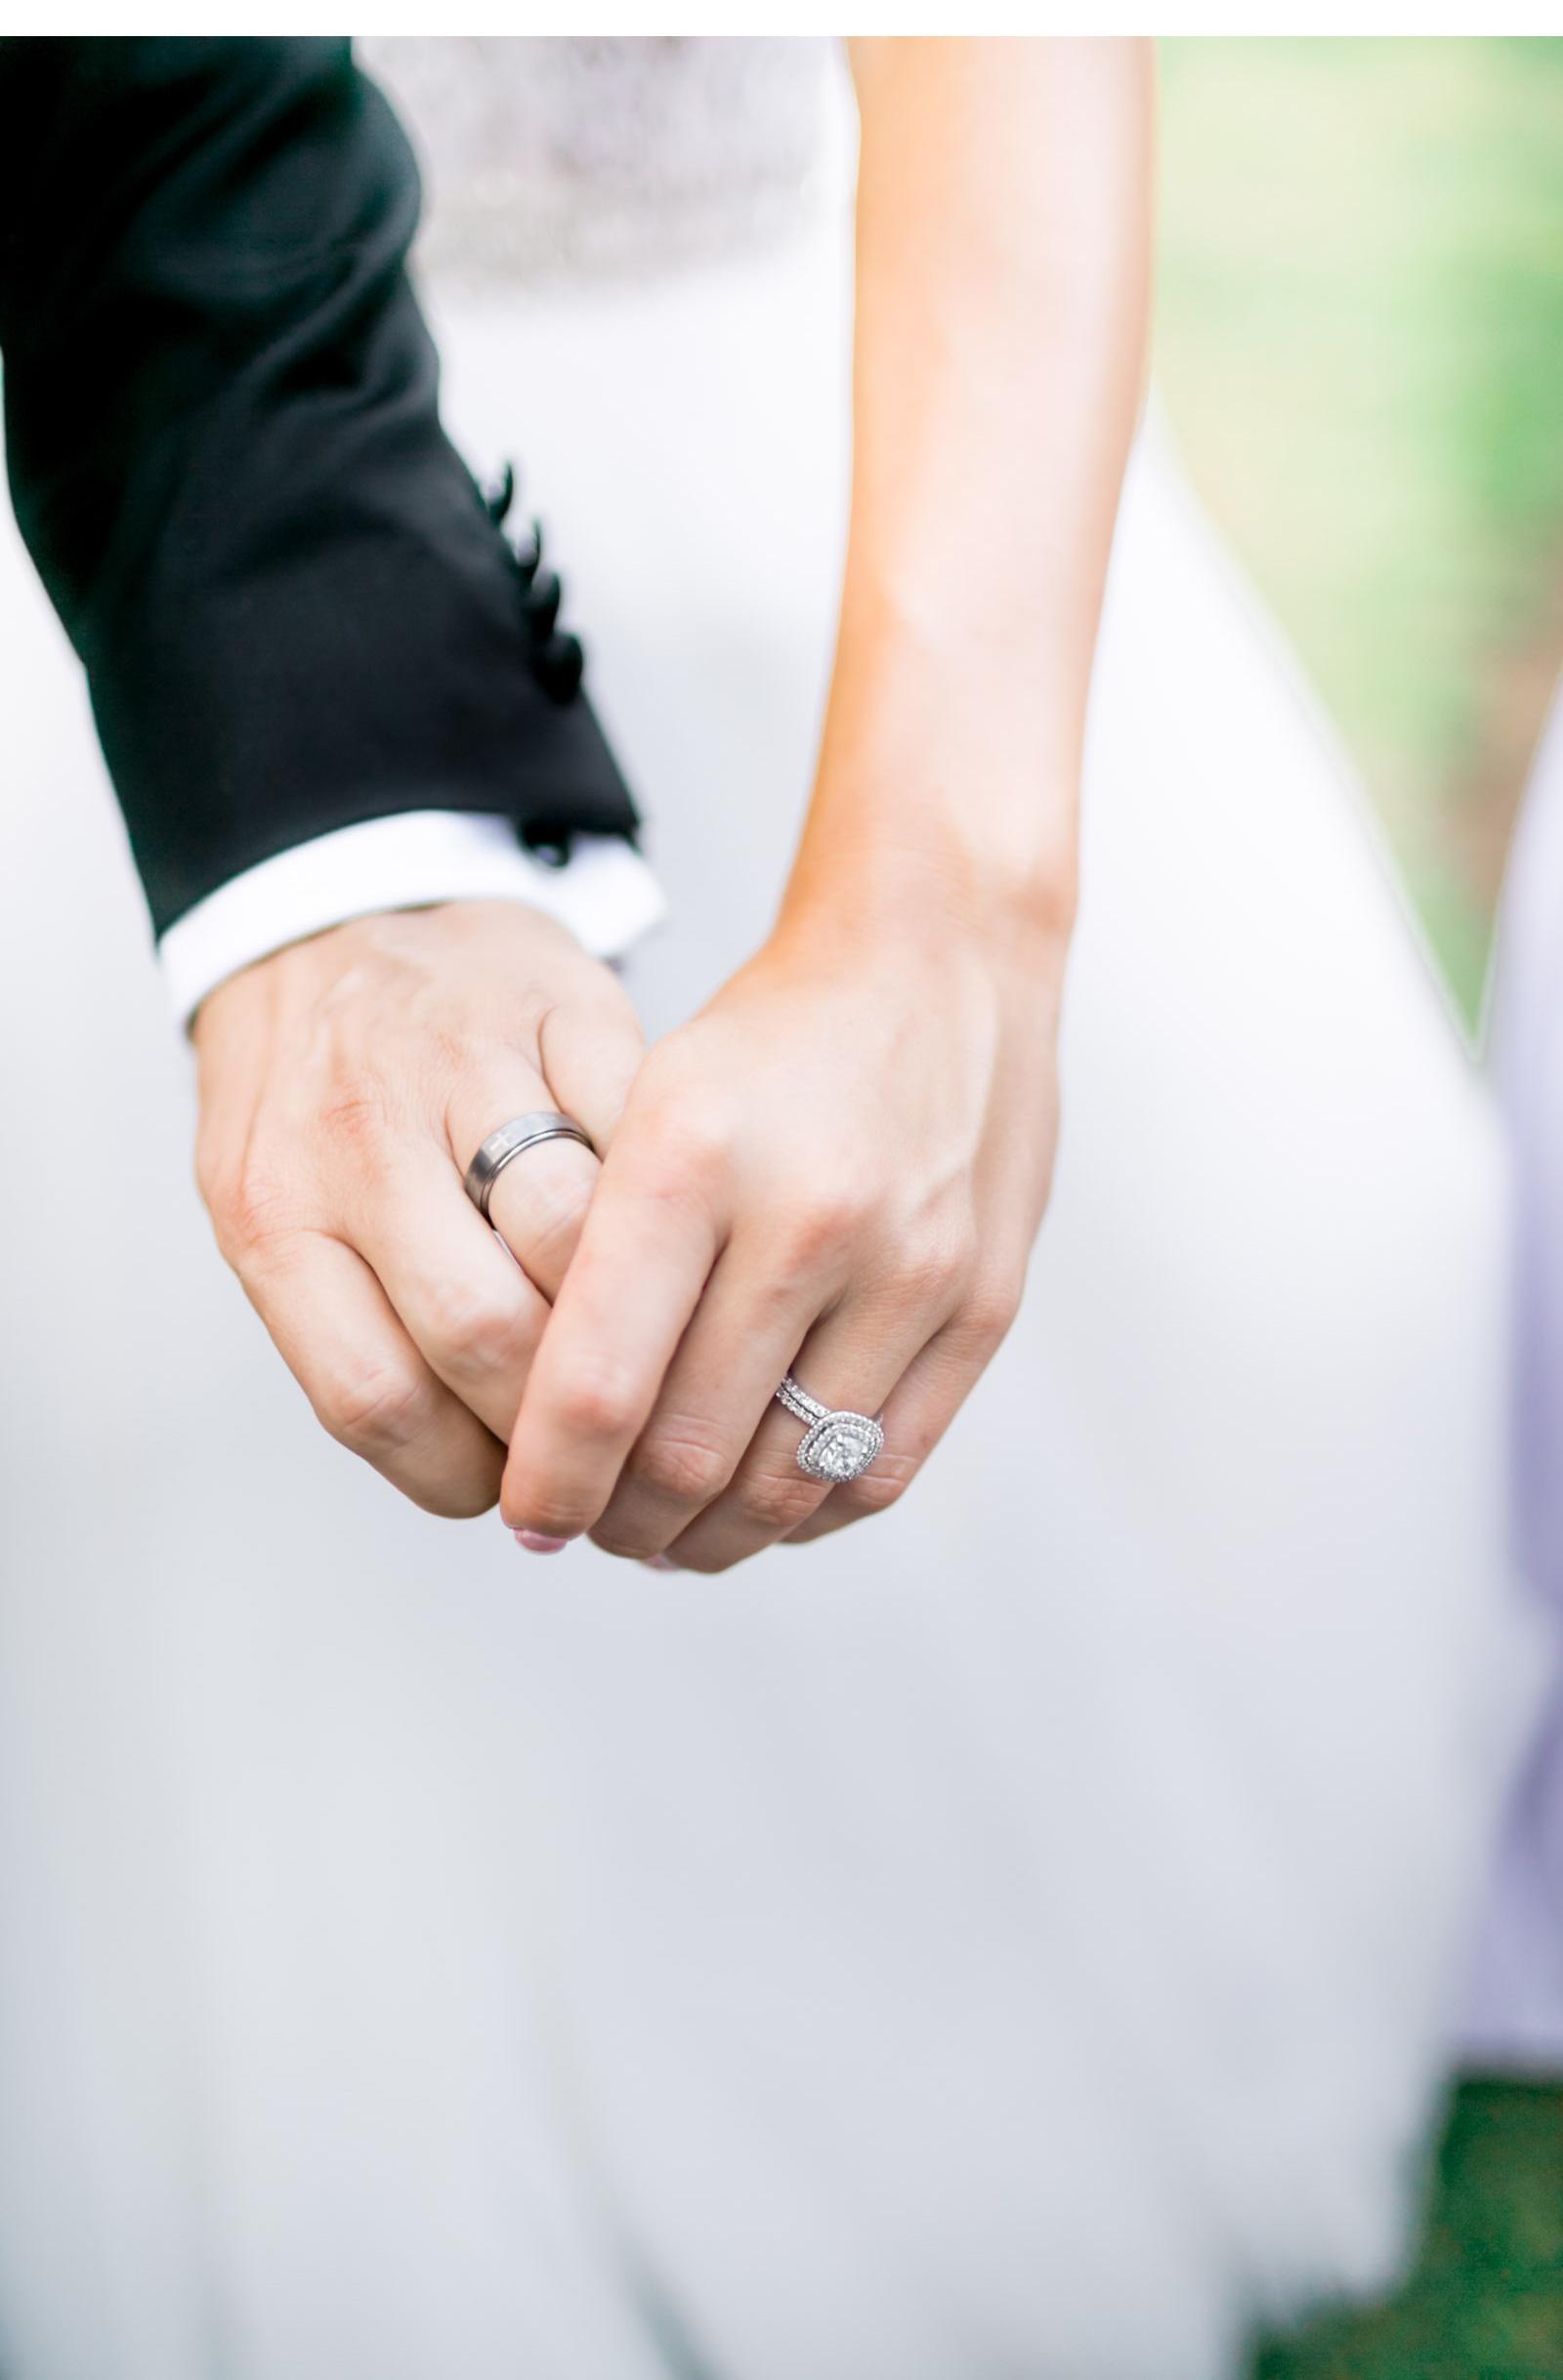 Nia-Sanchez-Temcula-Wedding-Natalie-Schutt-Photography_04.jpg